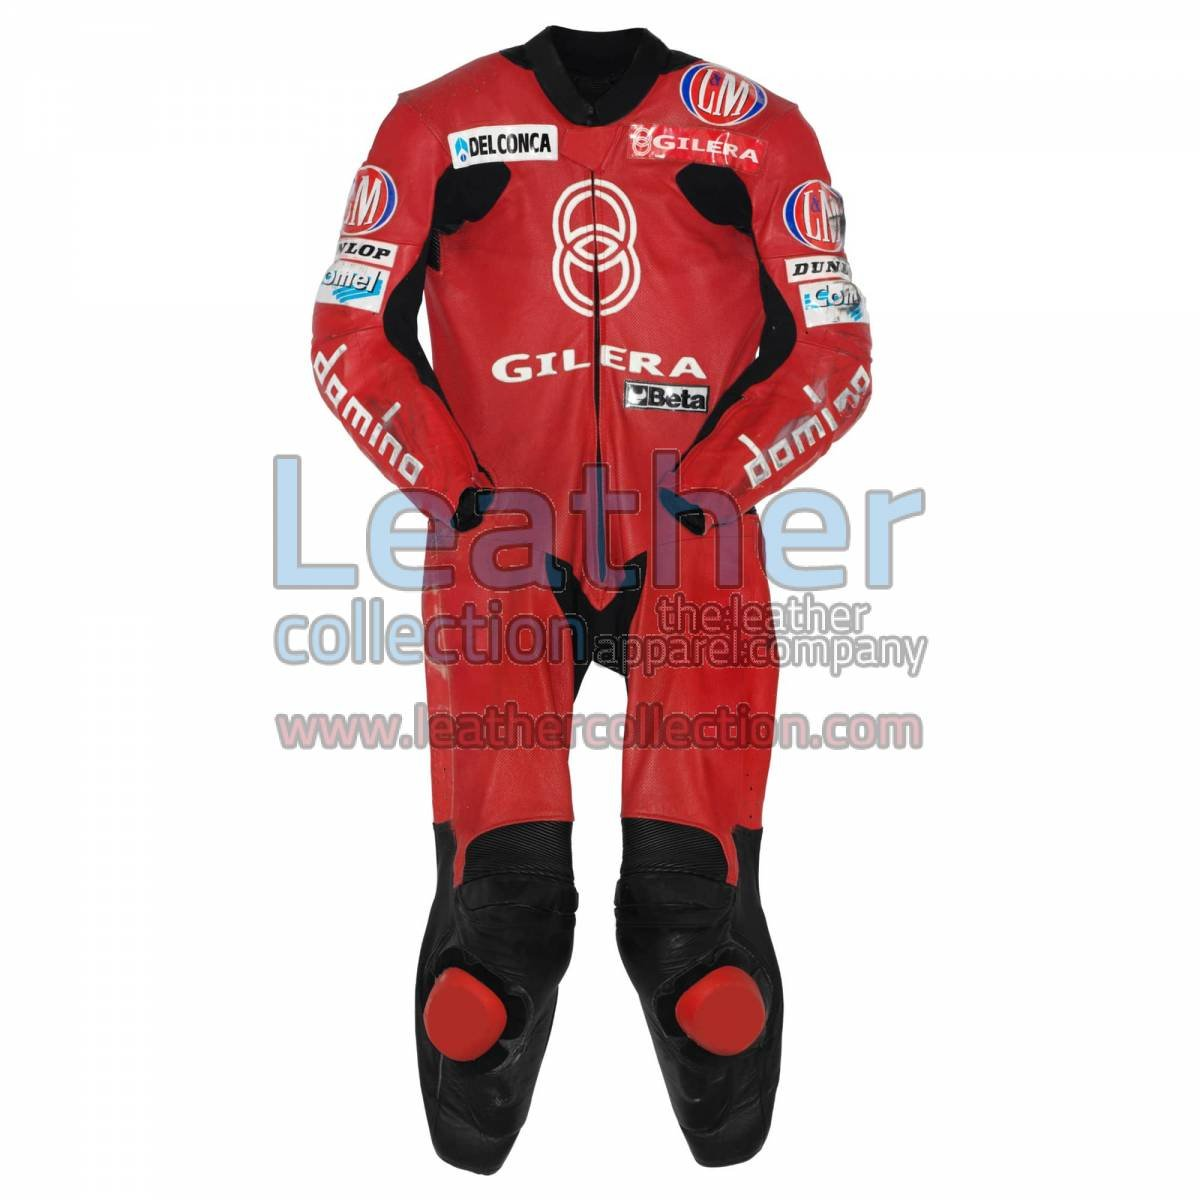 Manuel Poggiali Gilera Motorcycle Race Suit GP 2001